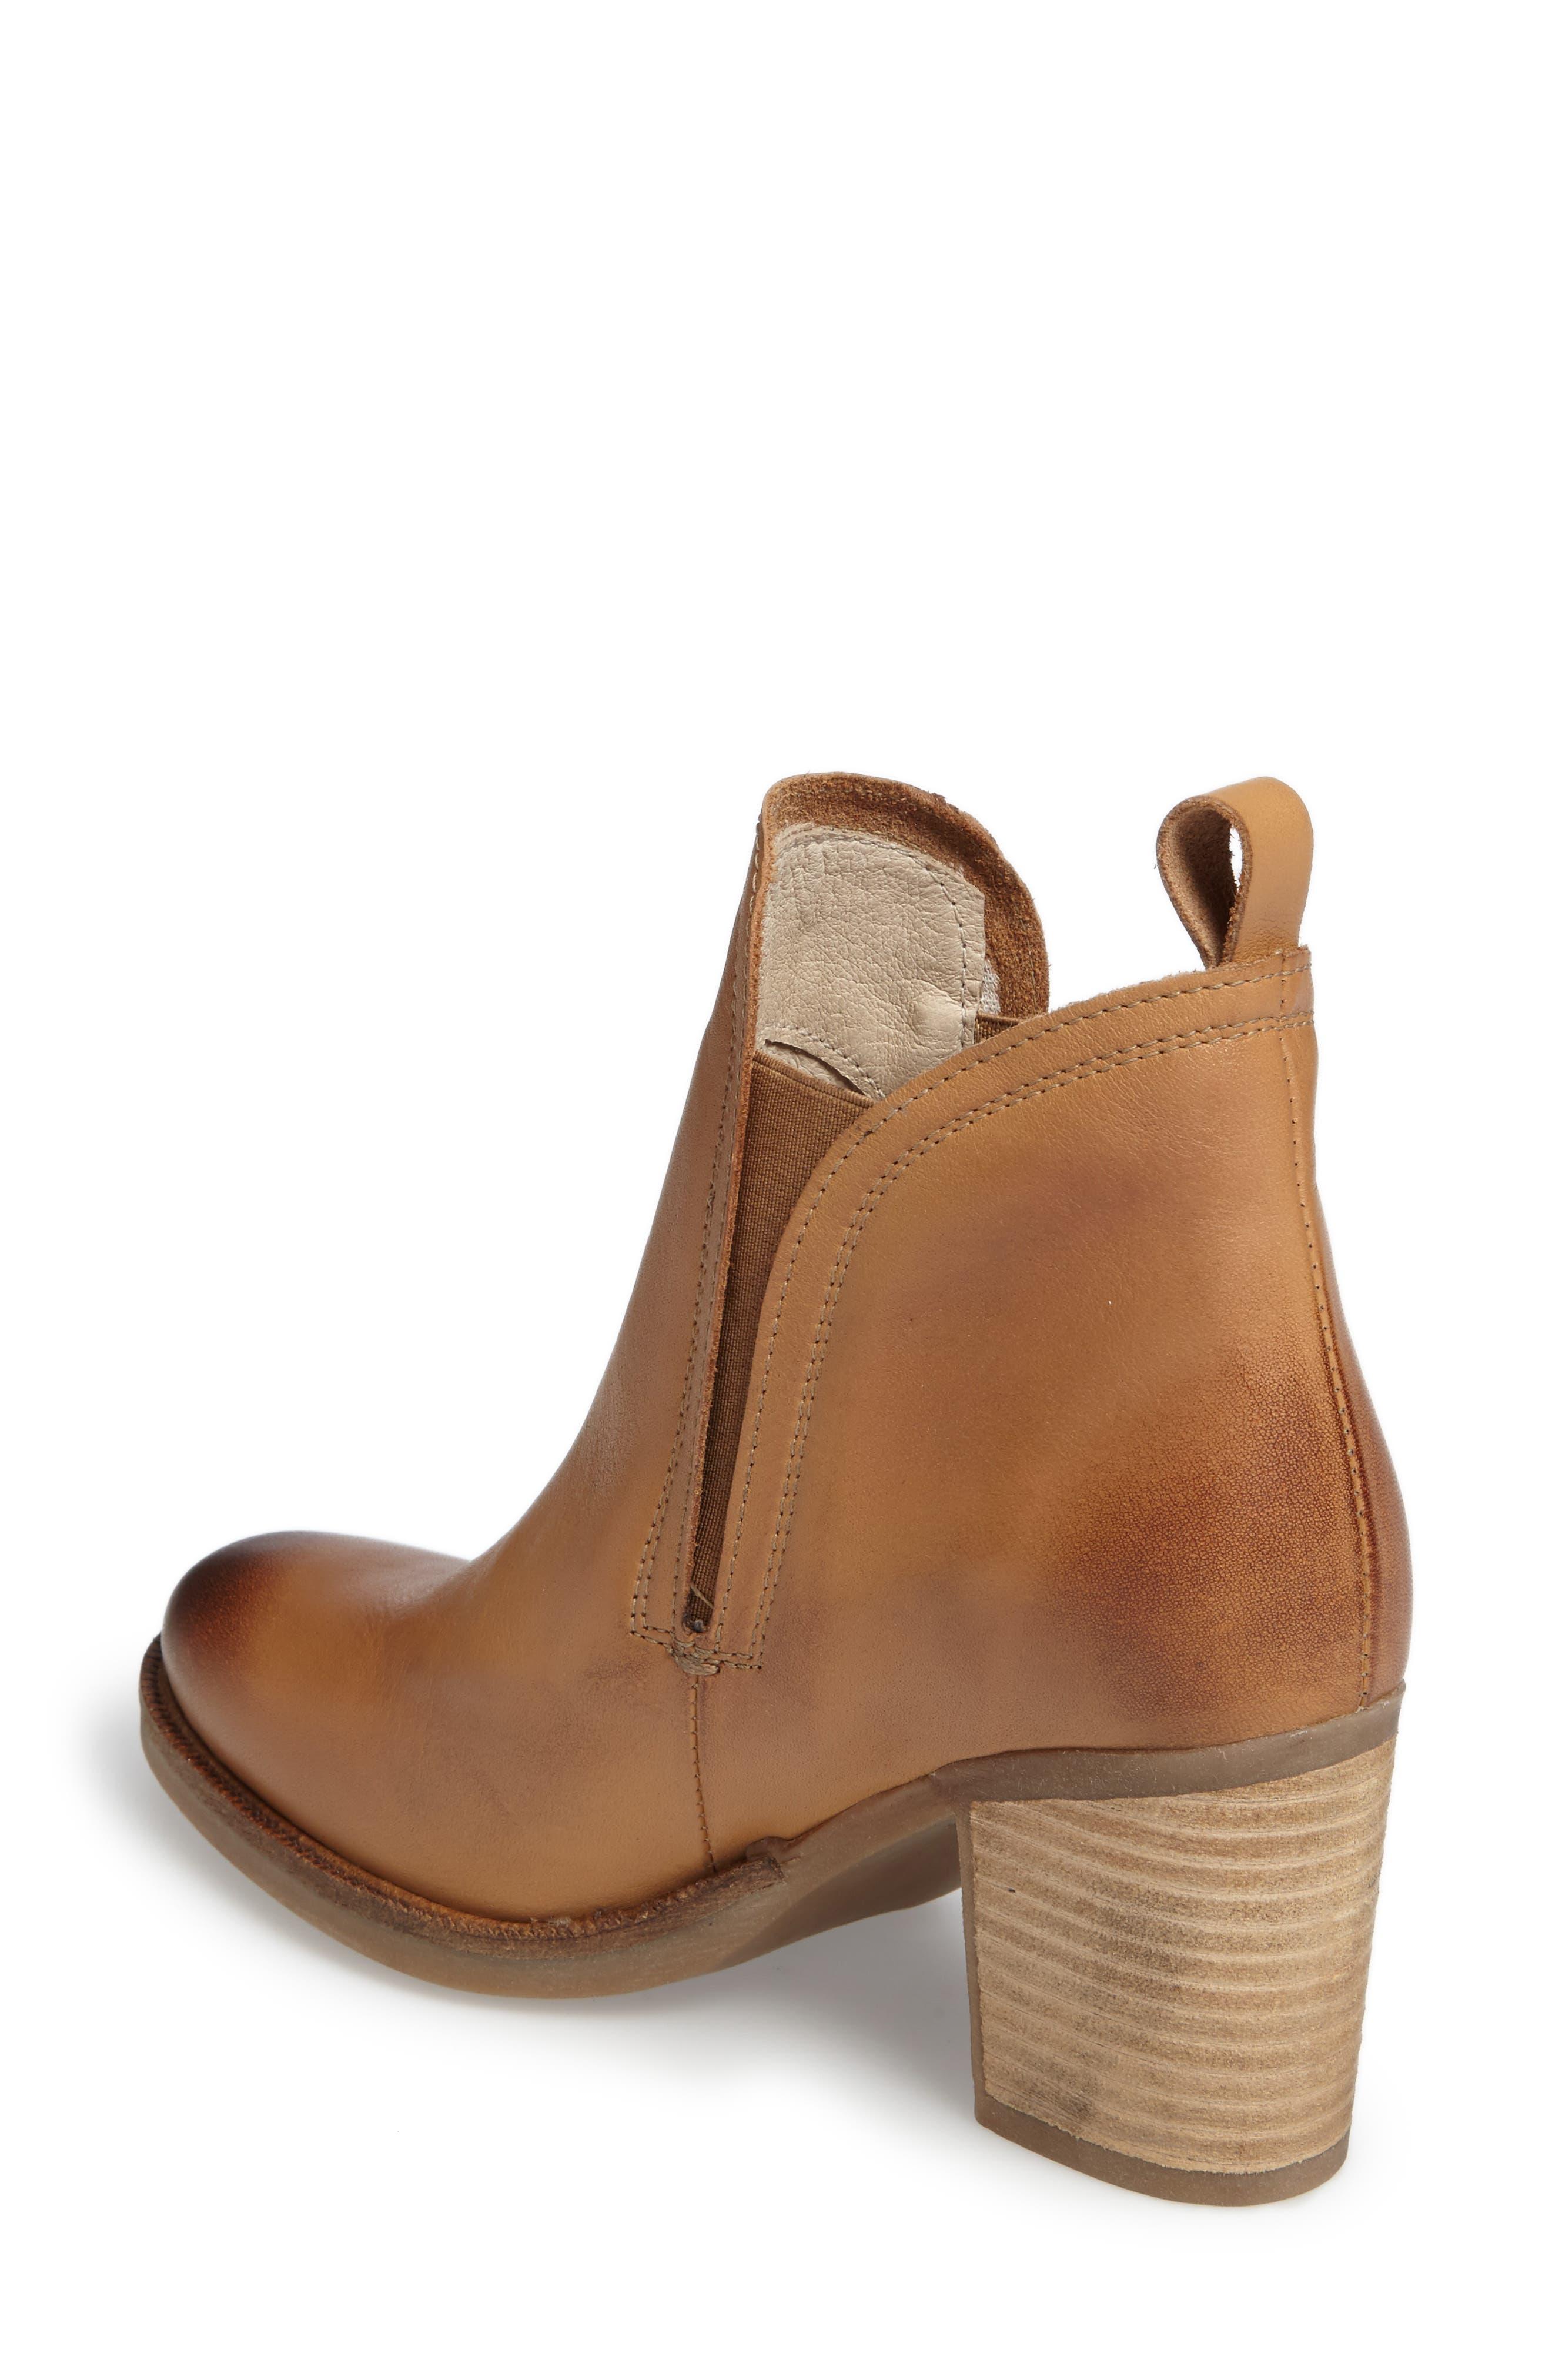 Belfielding Waterproof Chelsea Boot,                             Alternate thumbnail 8, color,